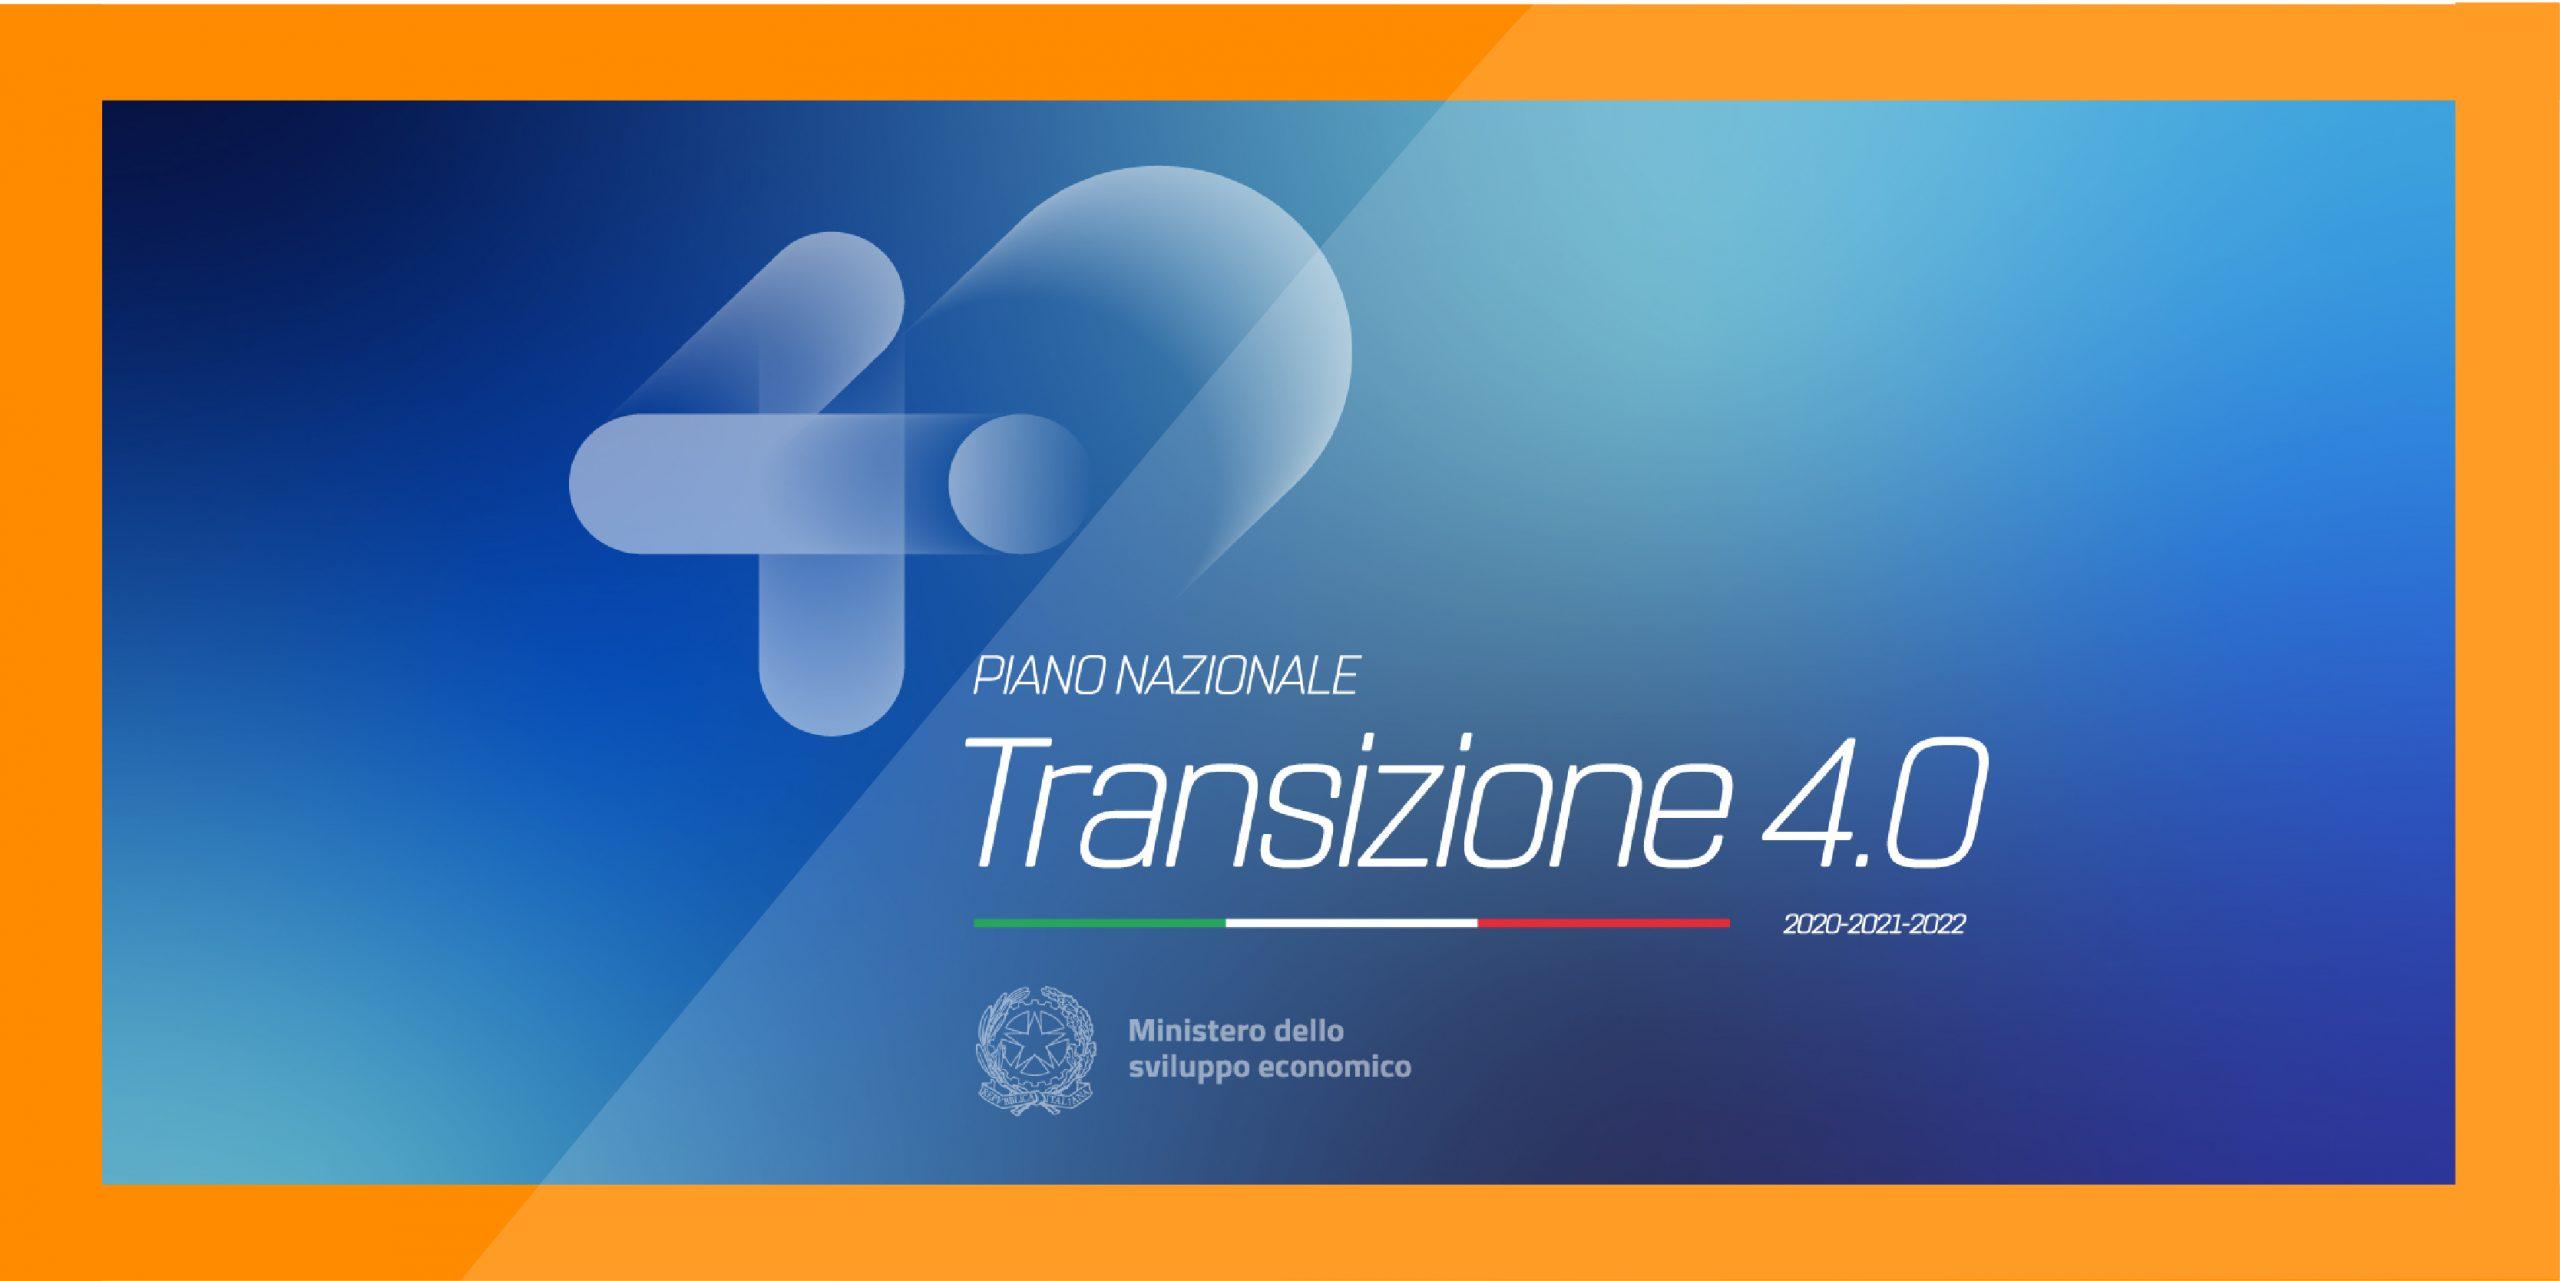 Industria 4.0 diventa Transizione 4.0